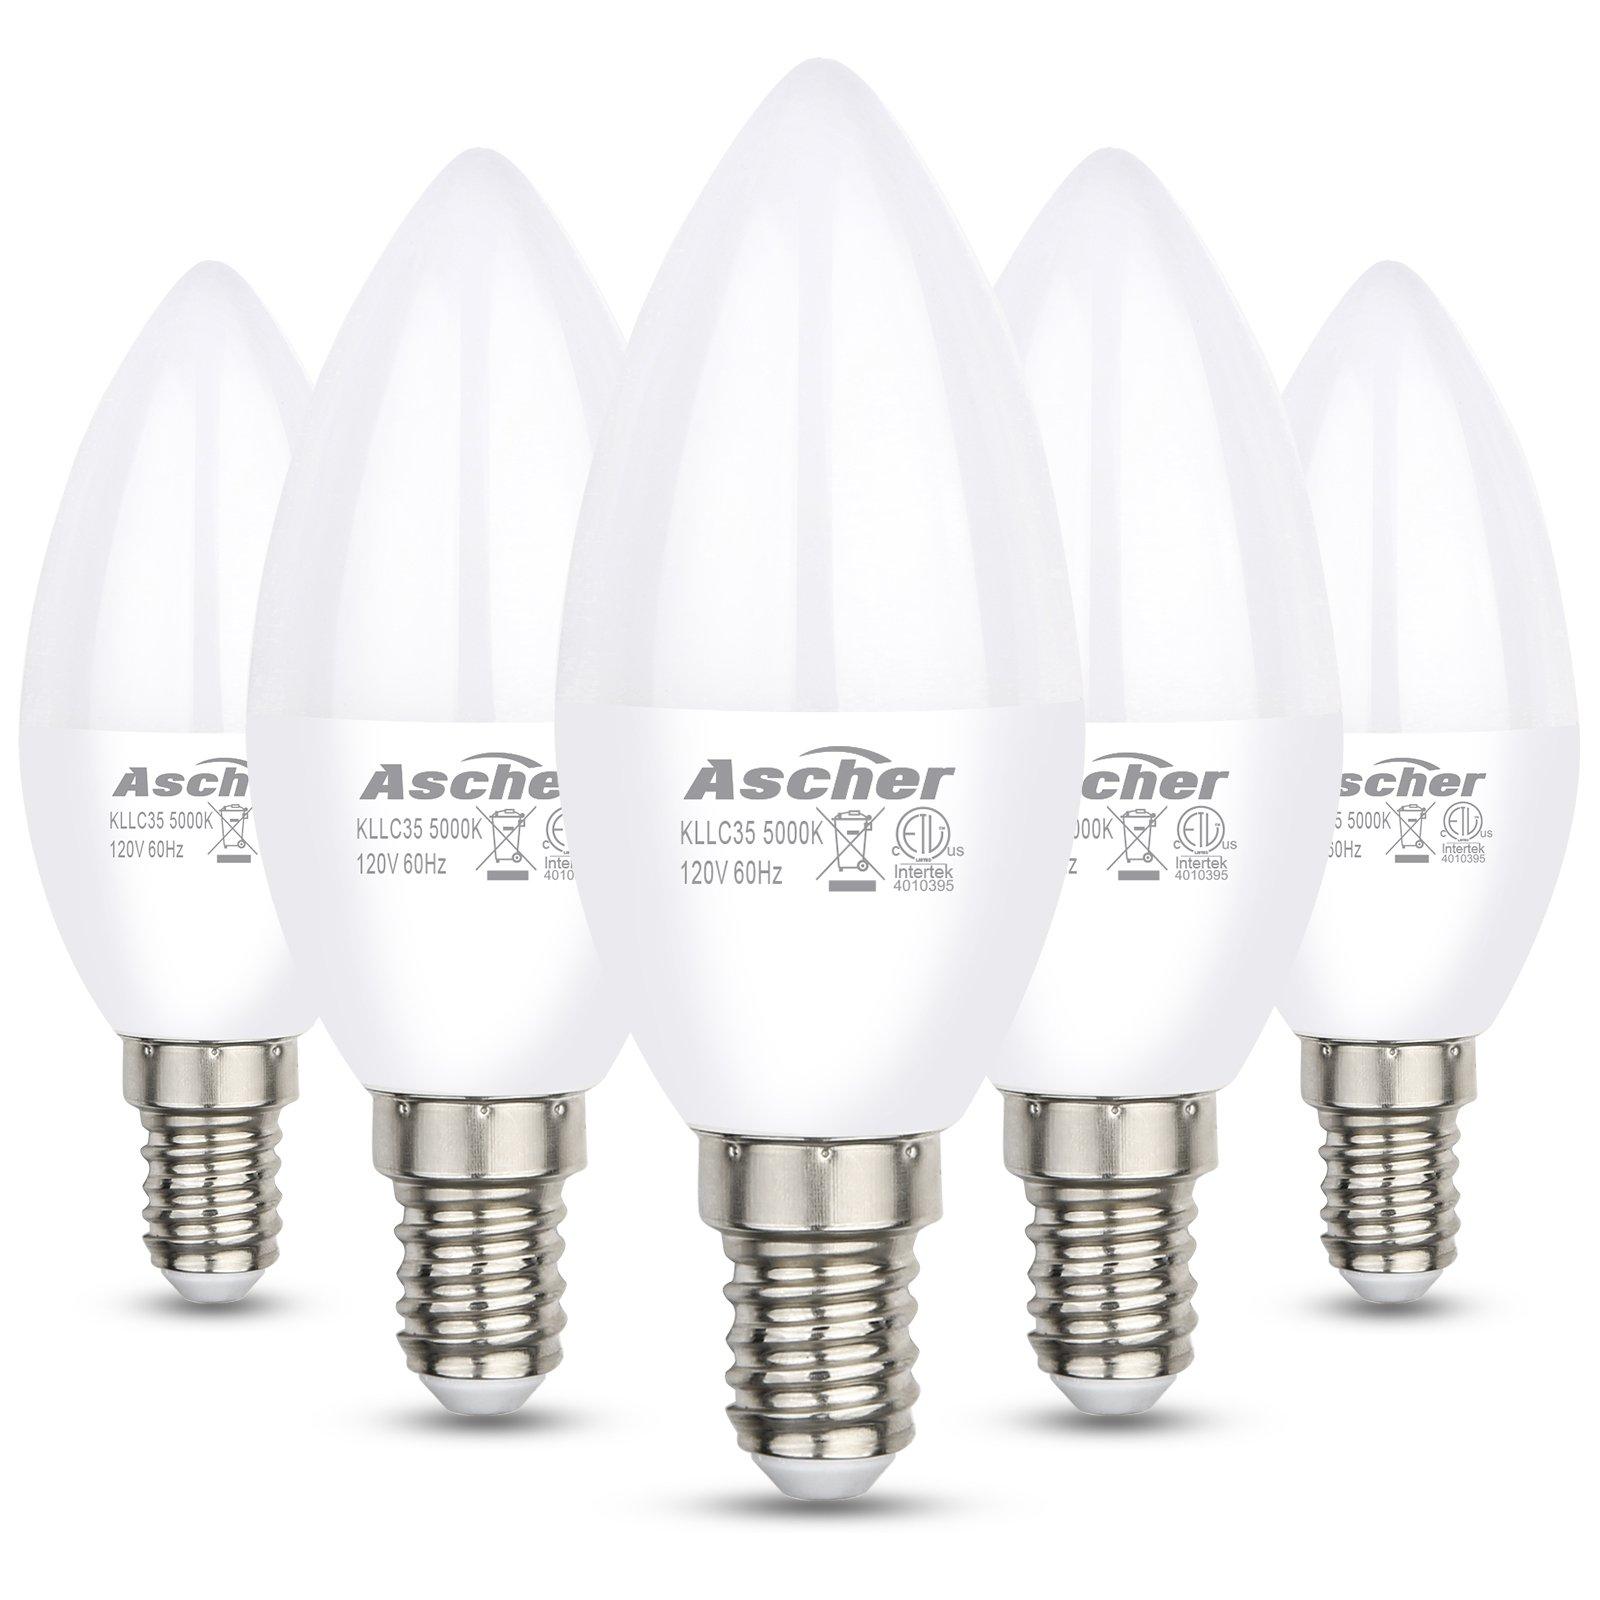 Ascher E12 LED Candelabra Light Bulbs, Equivalent 60W, 550LM, Daylight White 5000K, Candelabra Base, Non-dimmable, Chandelier Bulb, Pack of 5